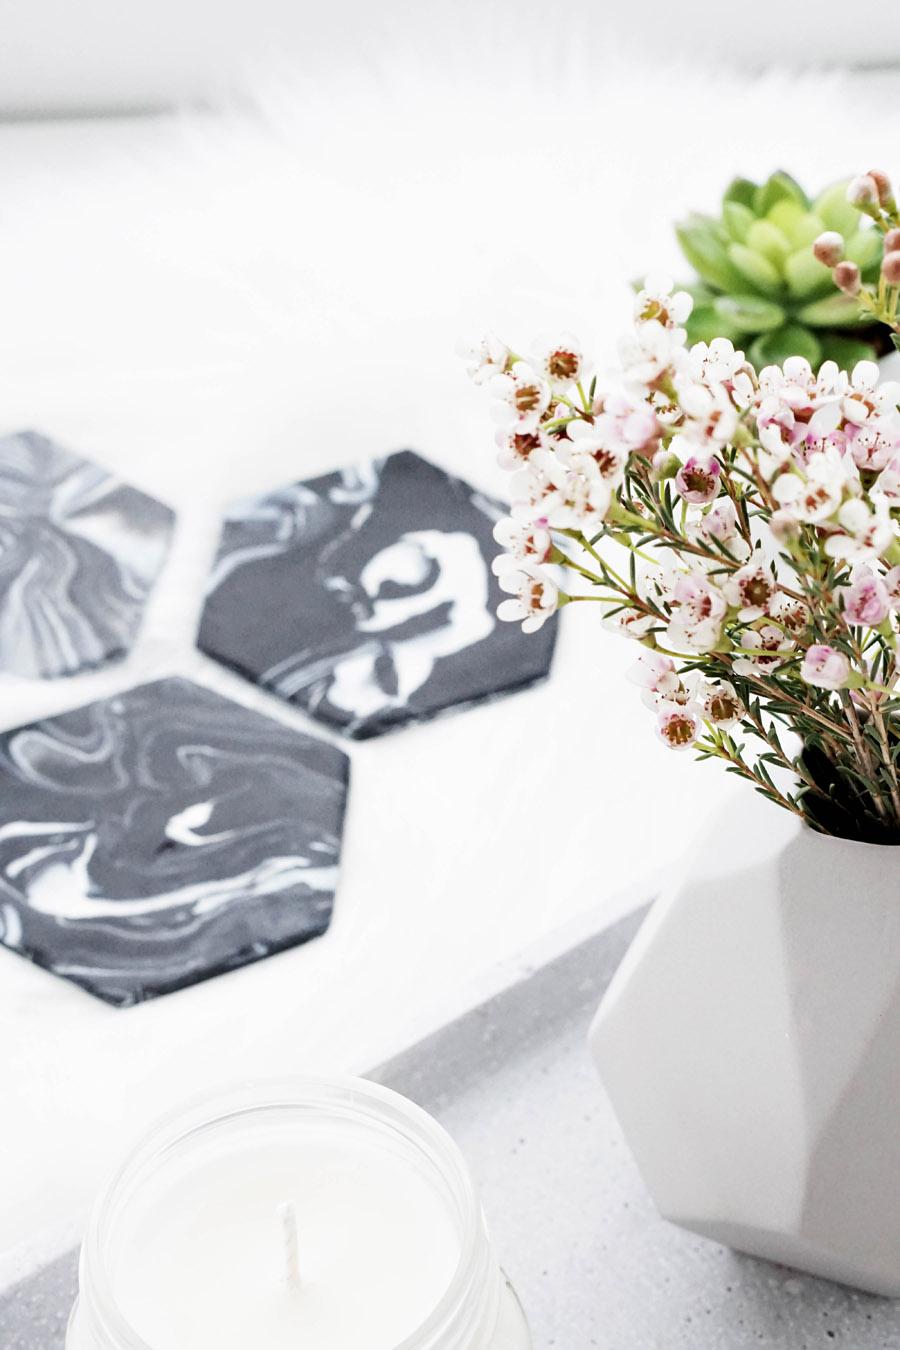 diy marmor untersetzer my mirror world. Black Bedroom Furniture Sets. Home Design Ideas